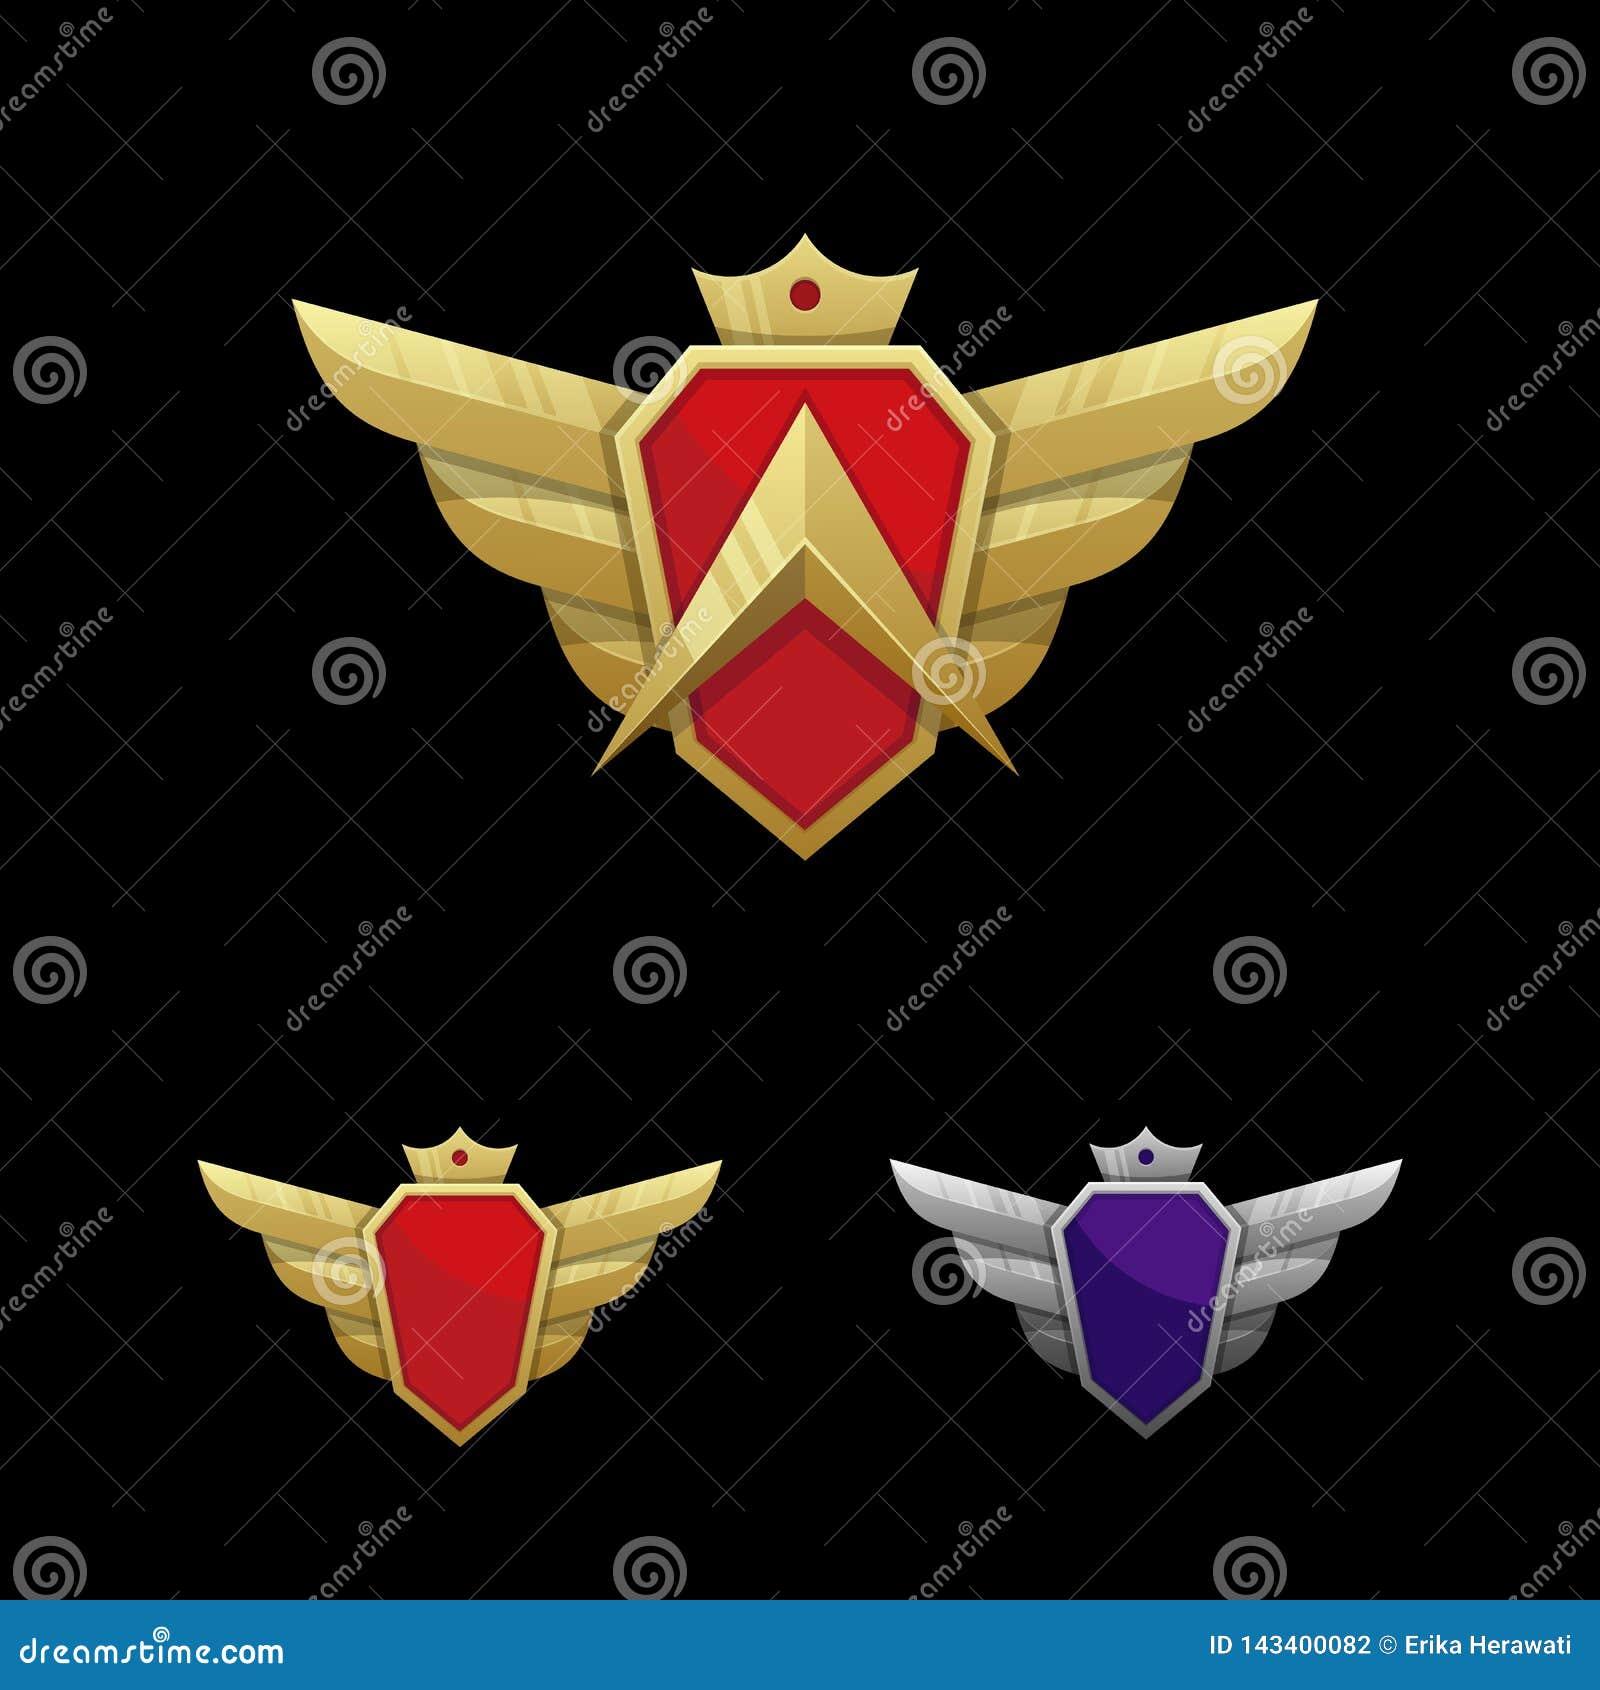 Wing Emblem Illustration Vector Template